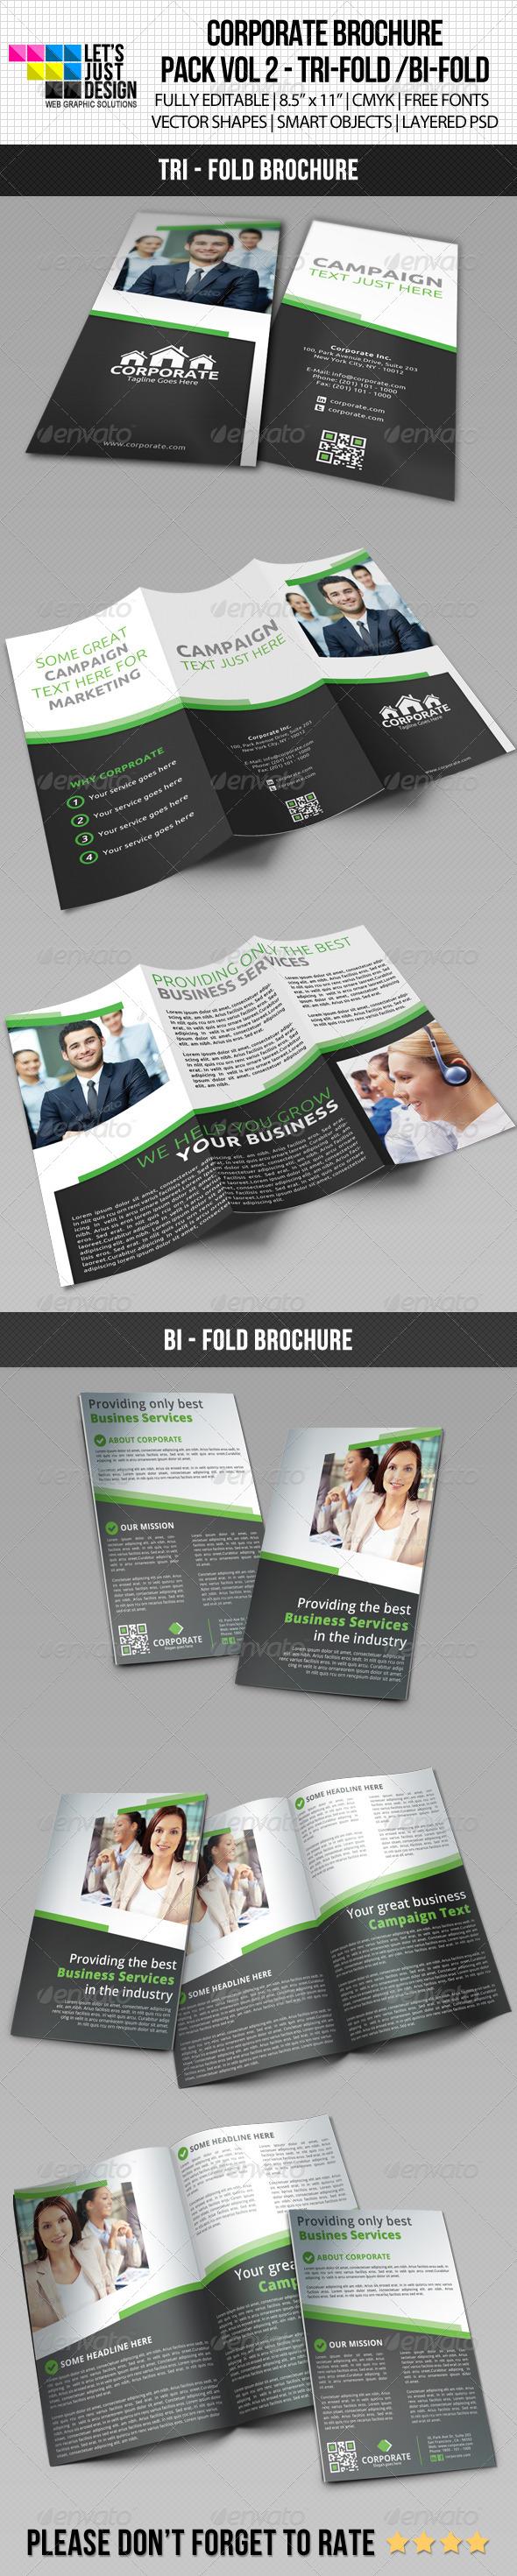 Corporate Brochure Pack Vol 2